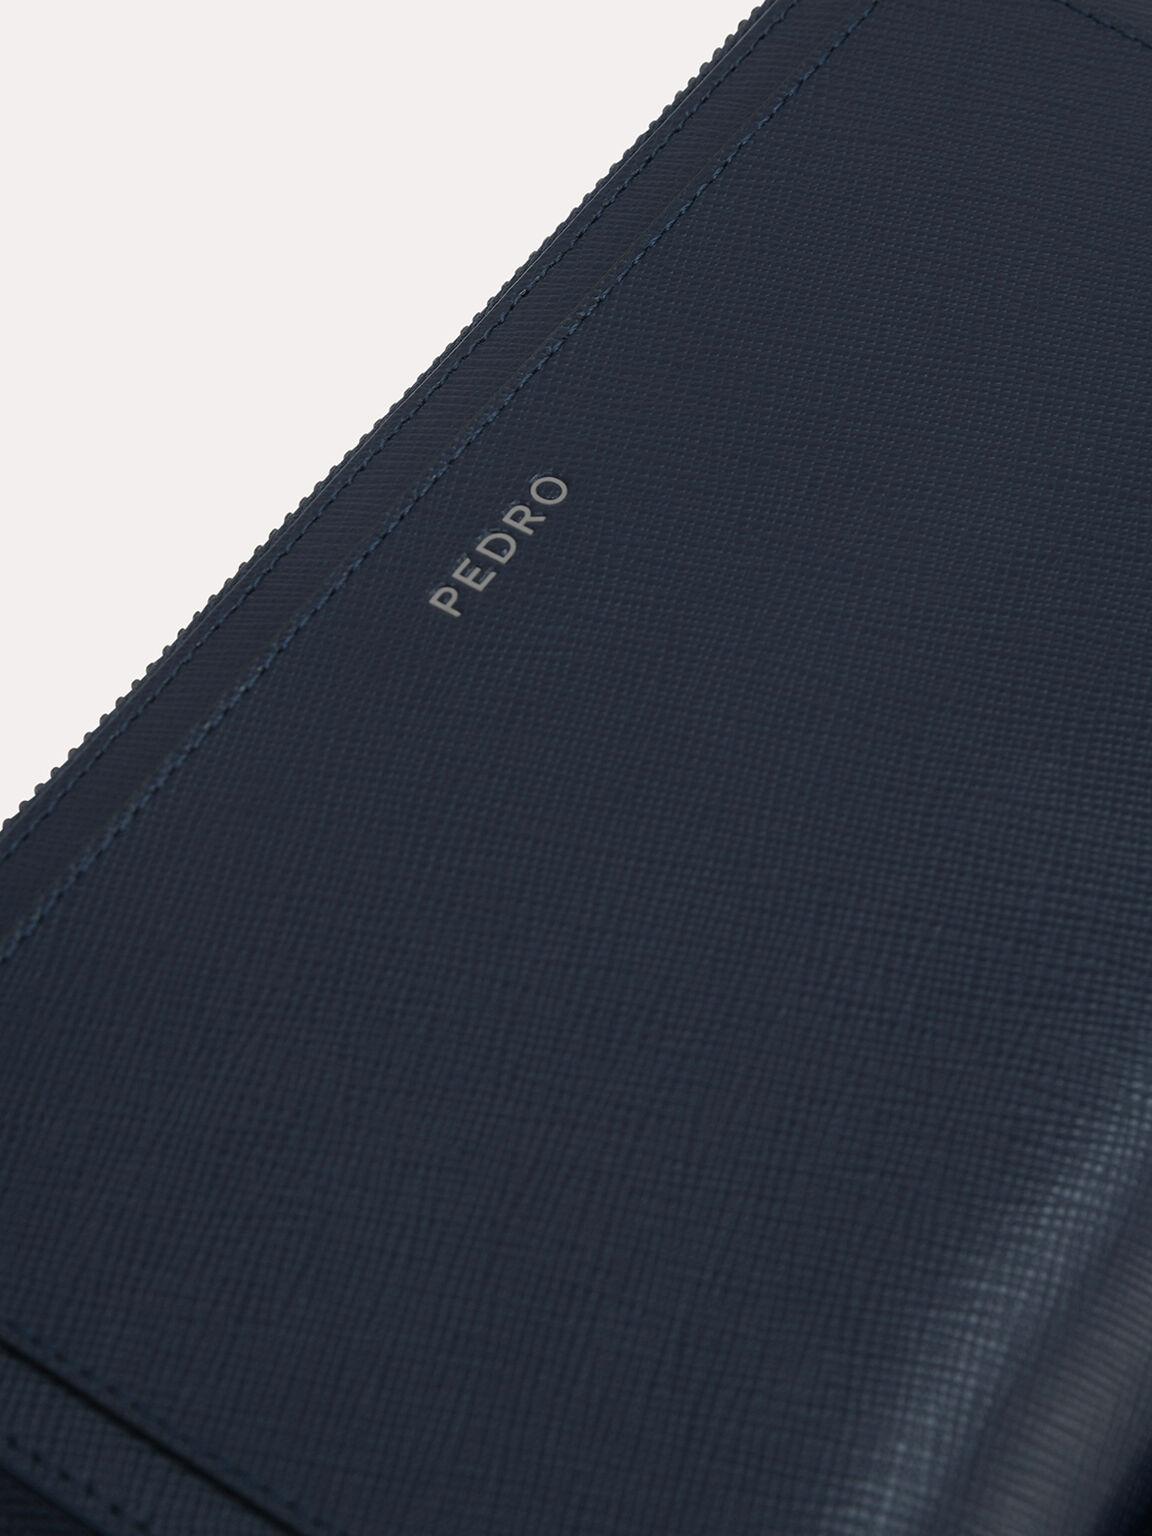 Textured Leather Travel Organiser, Navy, hi-res